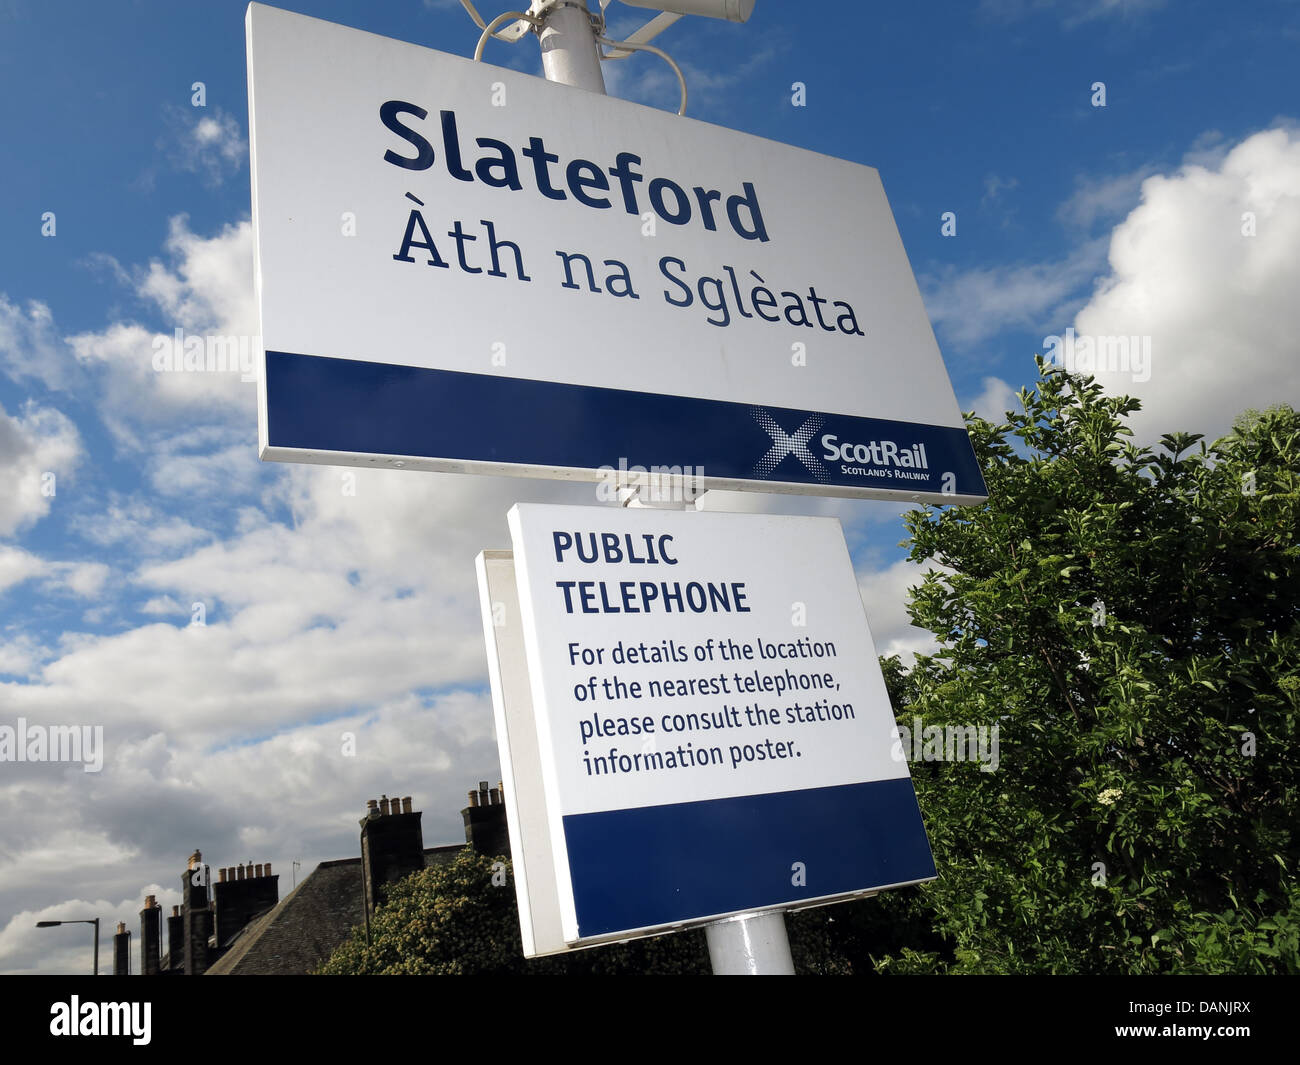 Multi-lingual,sign,in,Slateford,Railway,Station,in,Edinburgh,Scotland,UK,united,kingdom,gb,great,Britain,british,brits,Ath,na,Sgleata,celtic,gaelic,gealic,language,scots,scottish,independence,independance,signage,signs,railroad,rail,road,public,telephone,info,information,independence,scotrail,br,SLA,gotonysmith,Britishrail,line,train,trains,landscape,bilingual,bi-lingual,scots,sunny,day,summer,Buy Pictures of,Buy Images Of